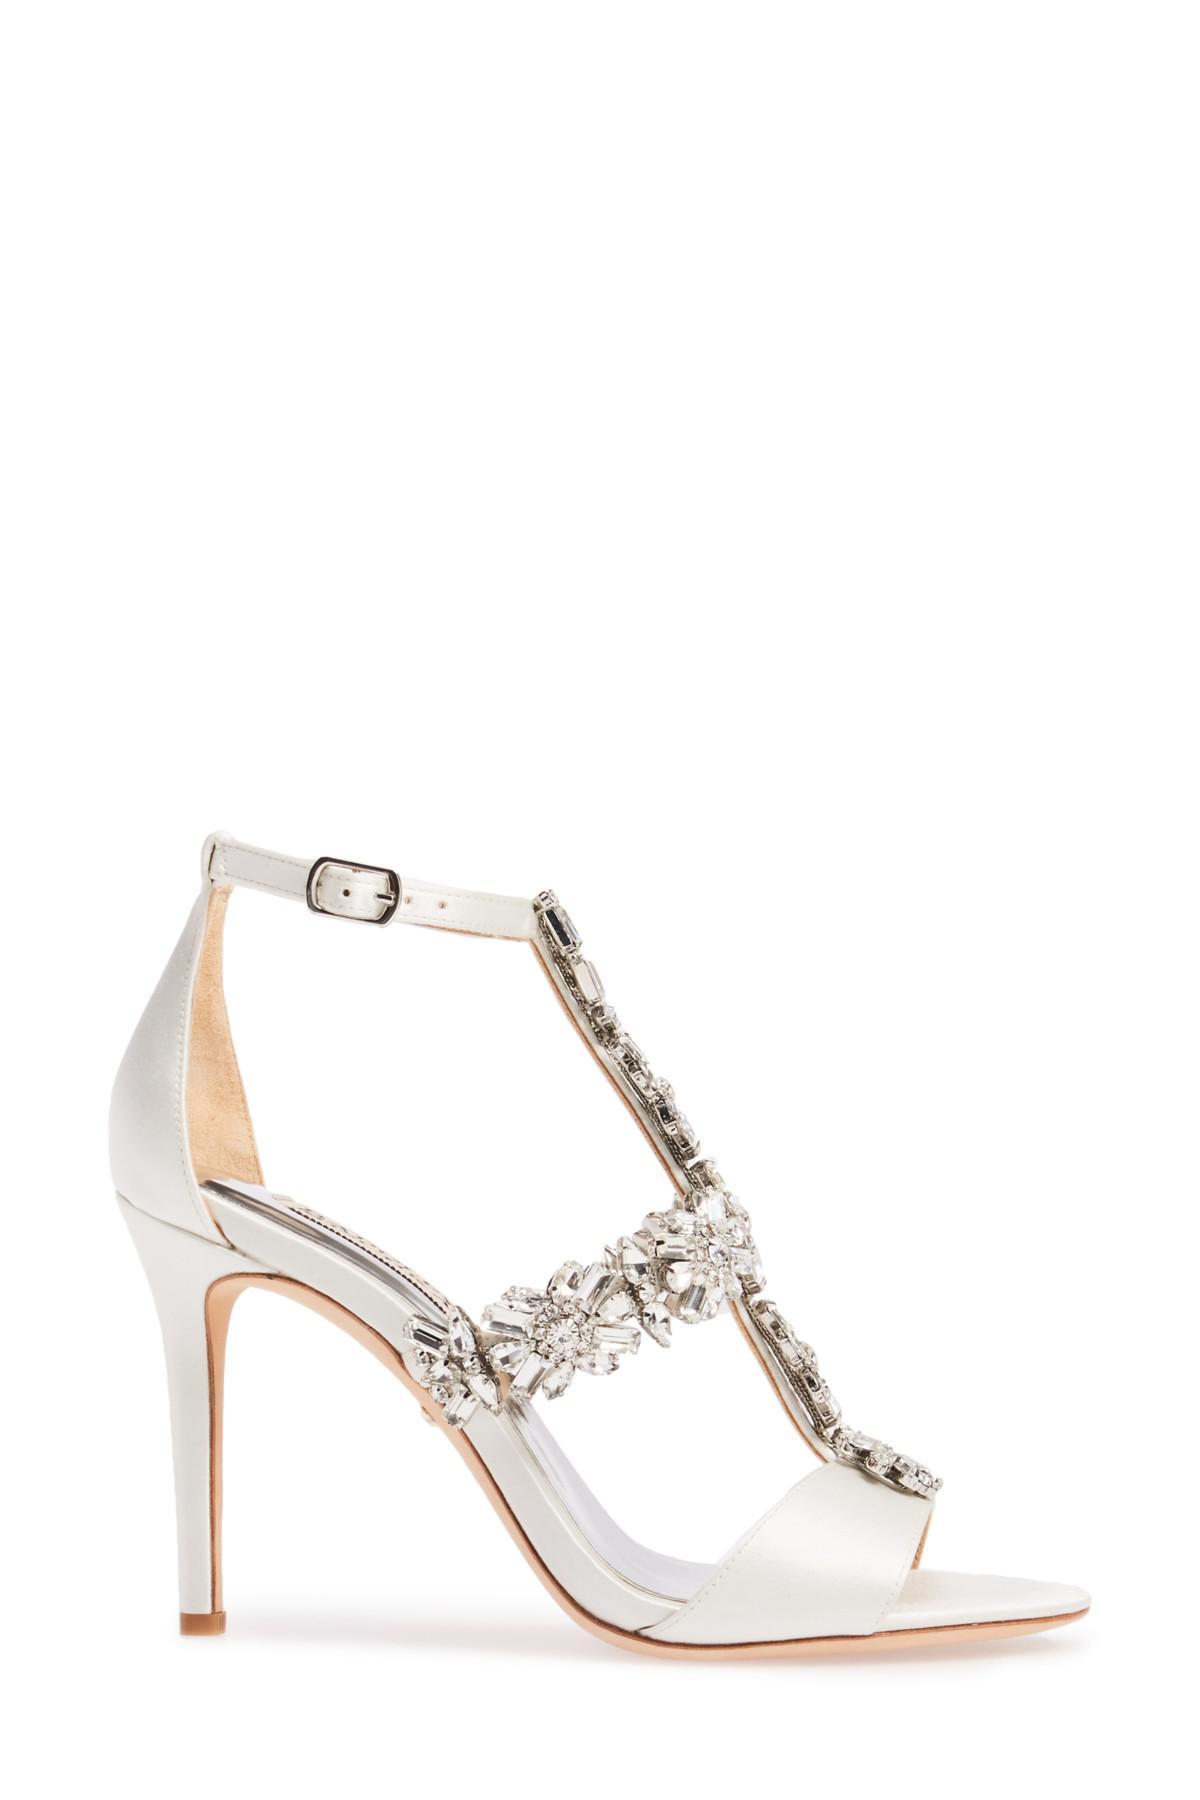 bd9ecb2703f Lyst - Badgley Mischka Munroe Embellished Sandal (women) in Metallic